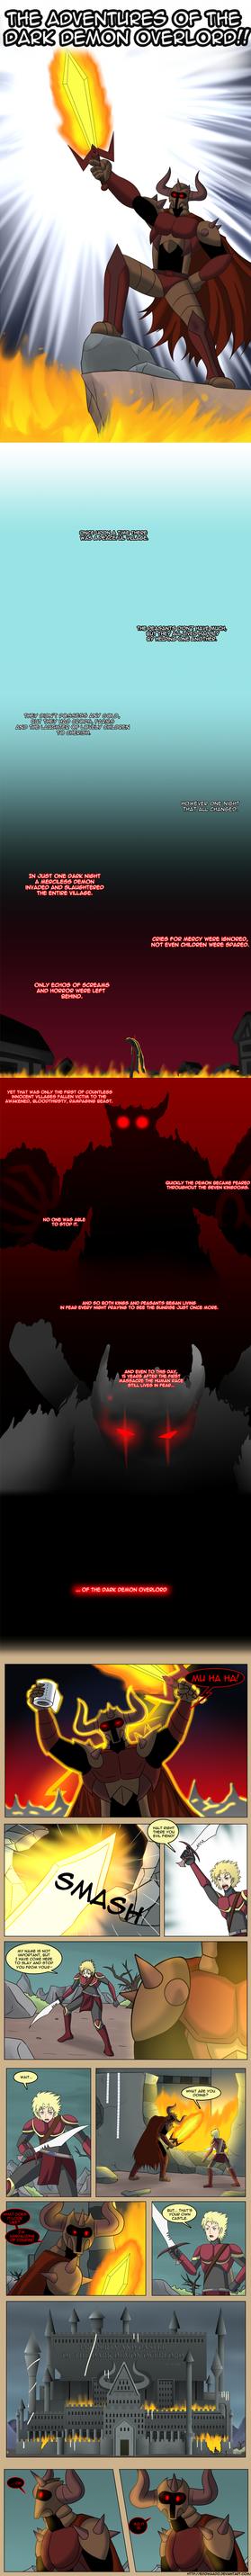 THE ADVENTURES OF THE DARK DEMON OVERLORD! Pt.1 by Edowaado